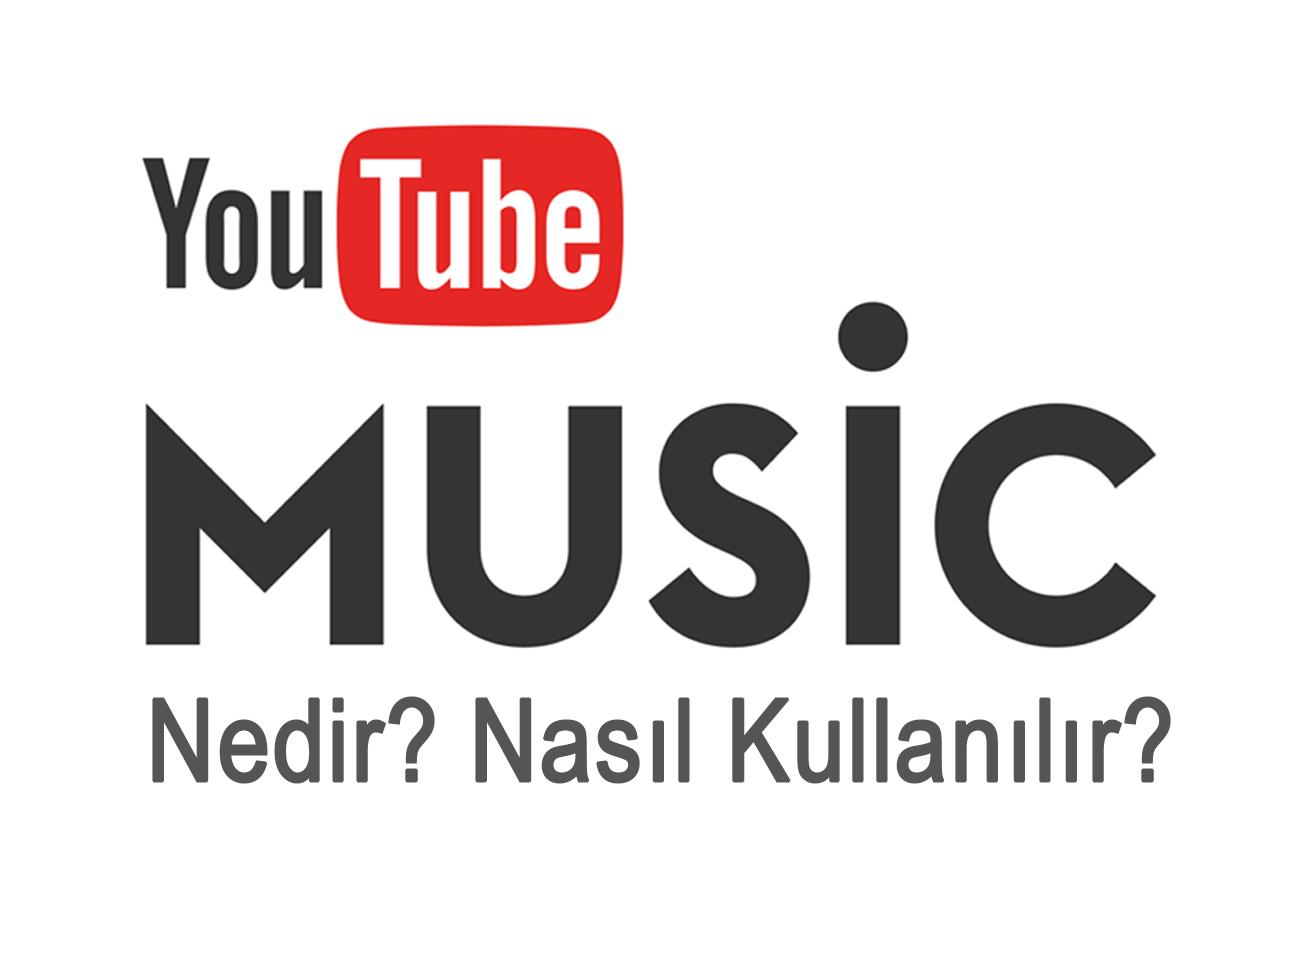 YouTube Music Nedir